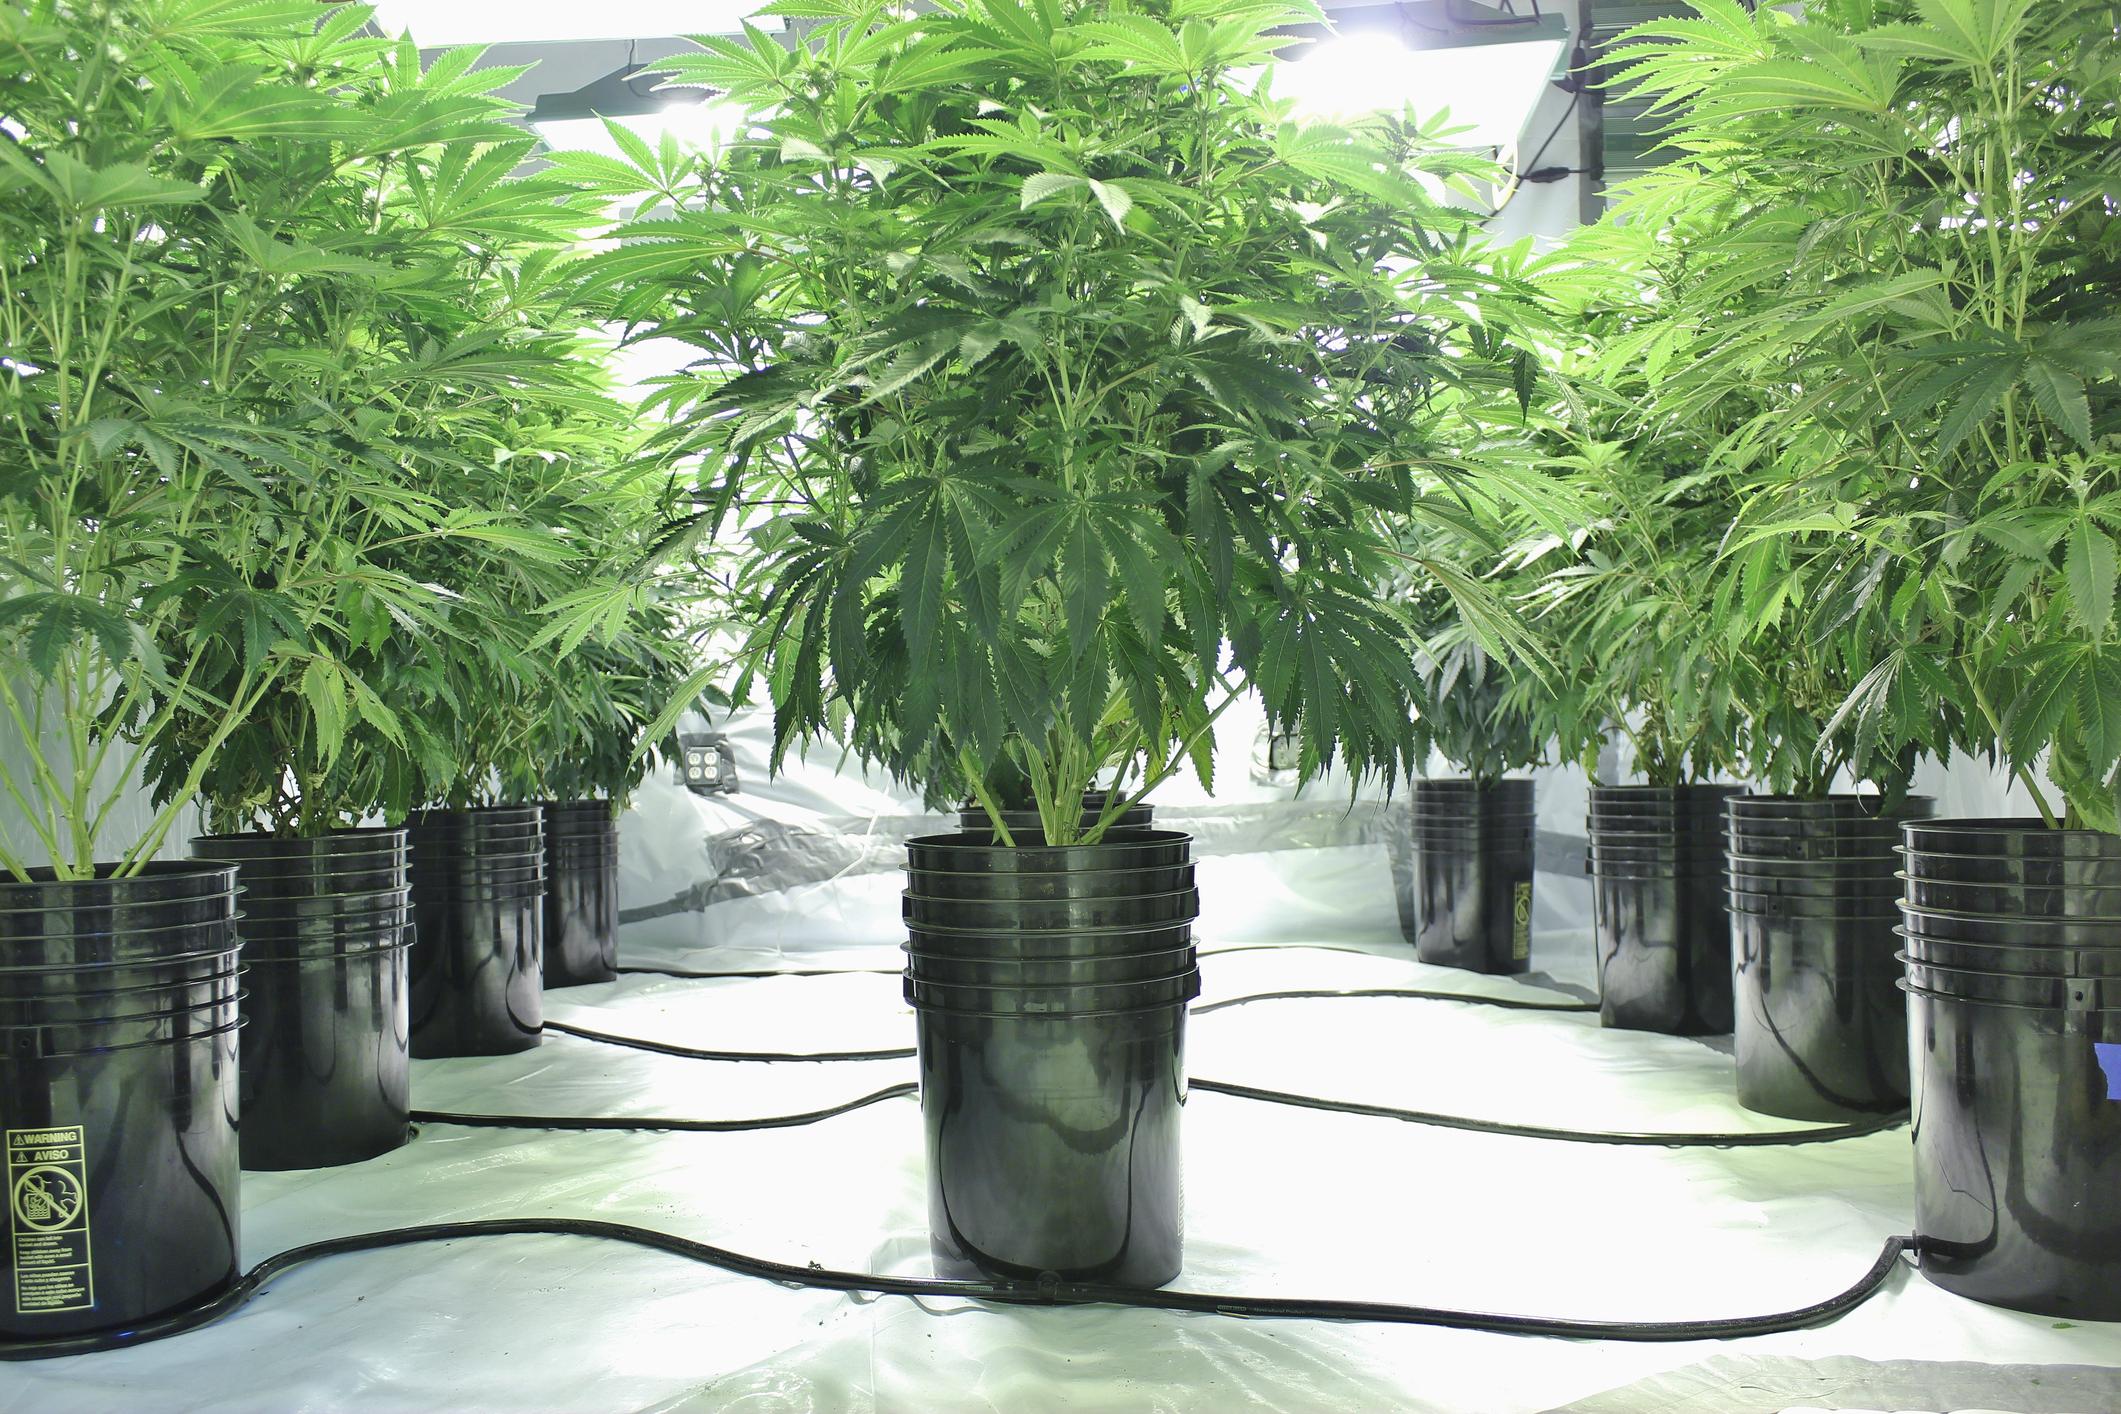 An indoor hydroponics cannabis grow farm.